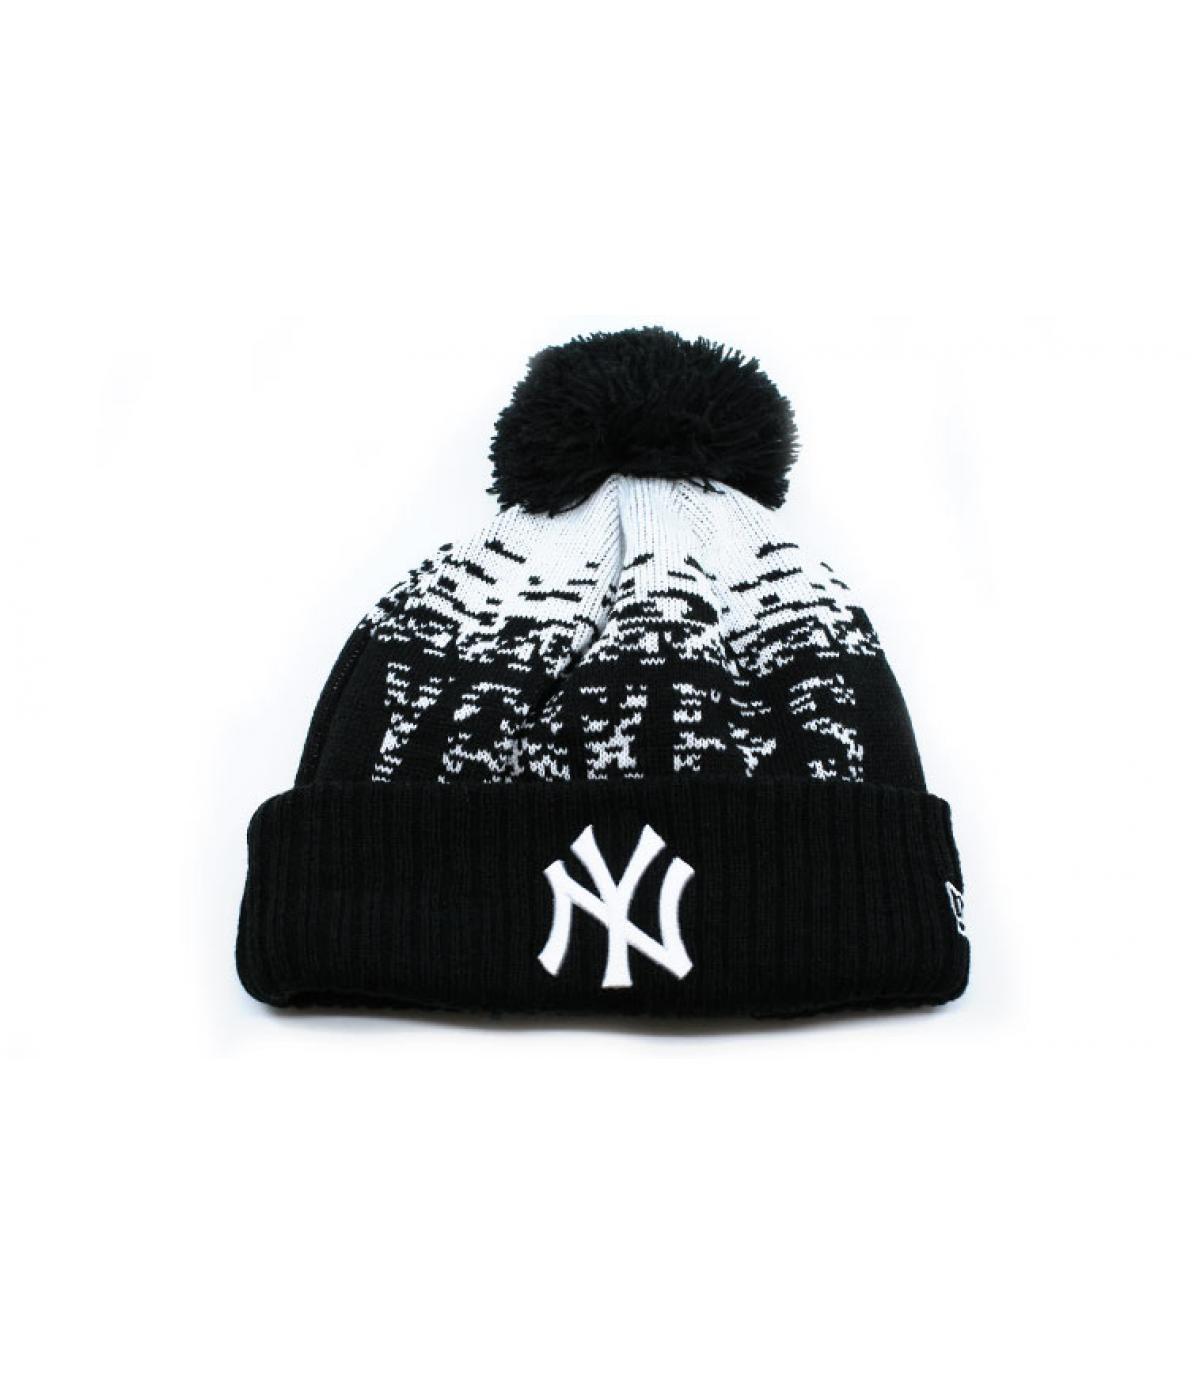 Détails Bonnet Kids NY MLB Sport Knit - image 2